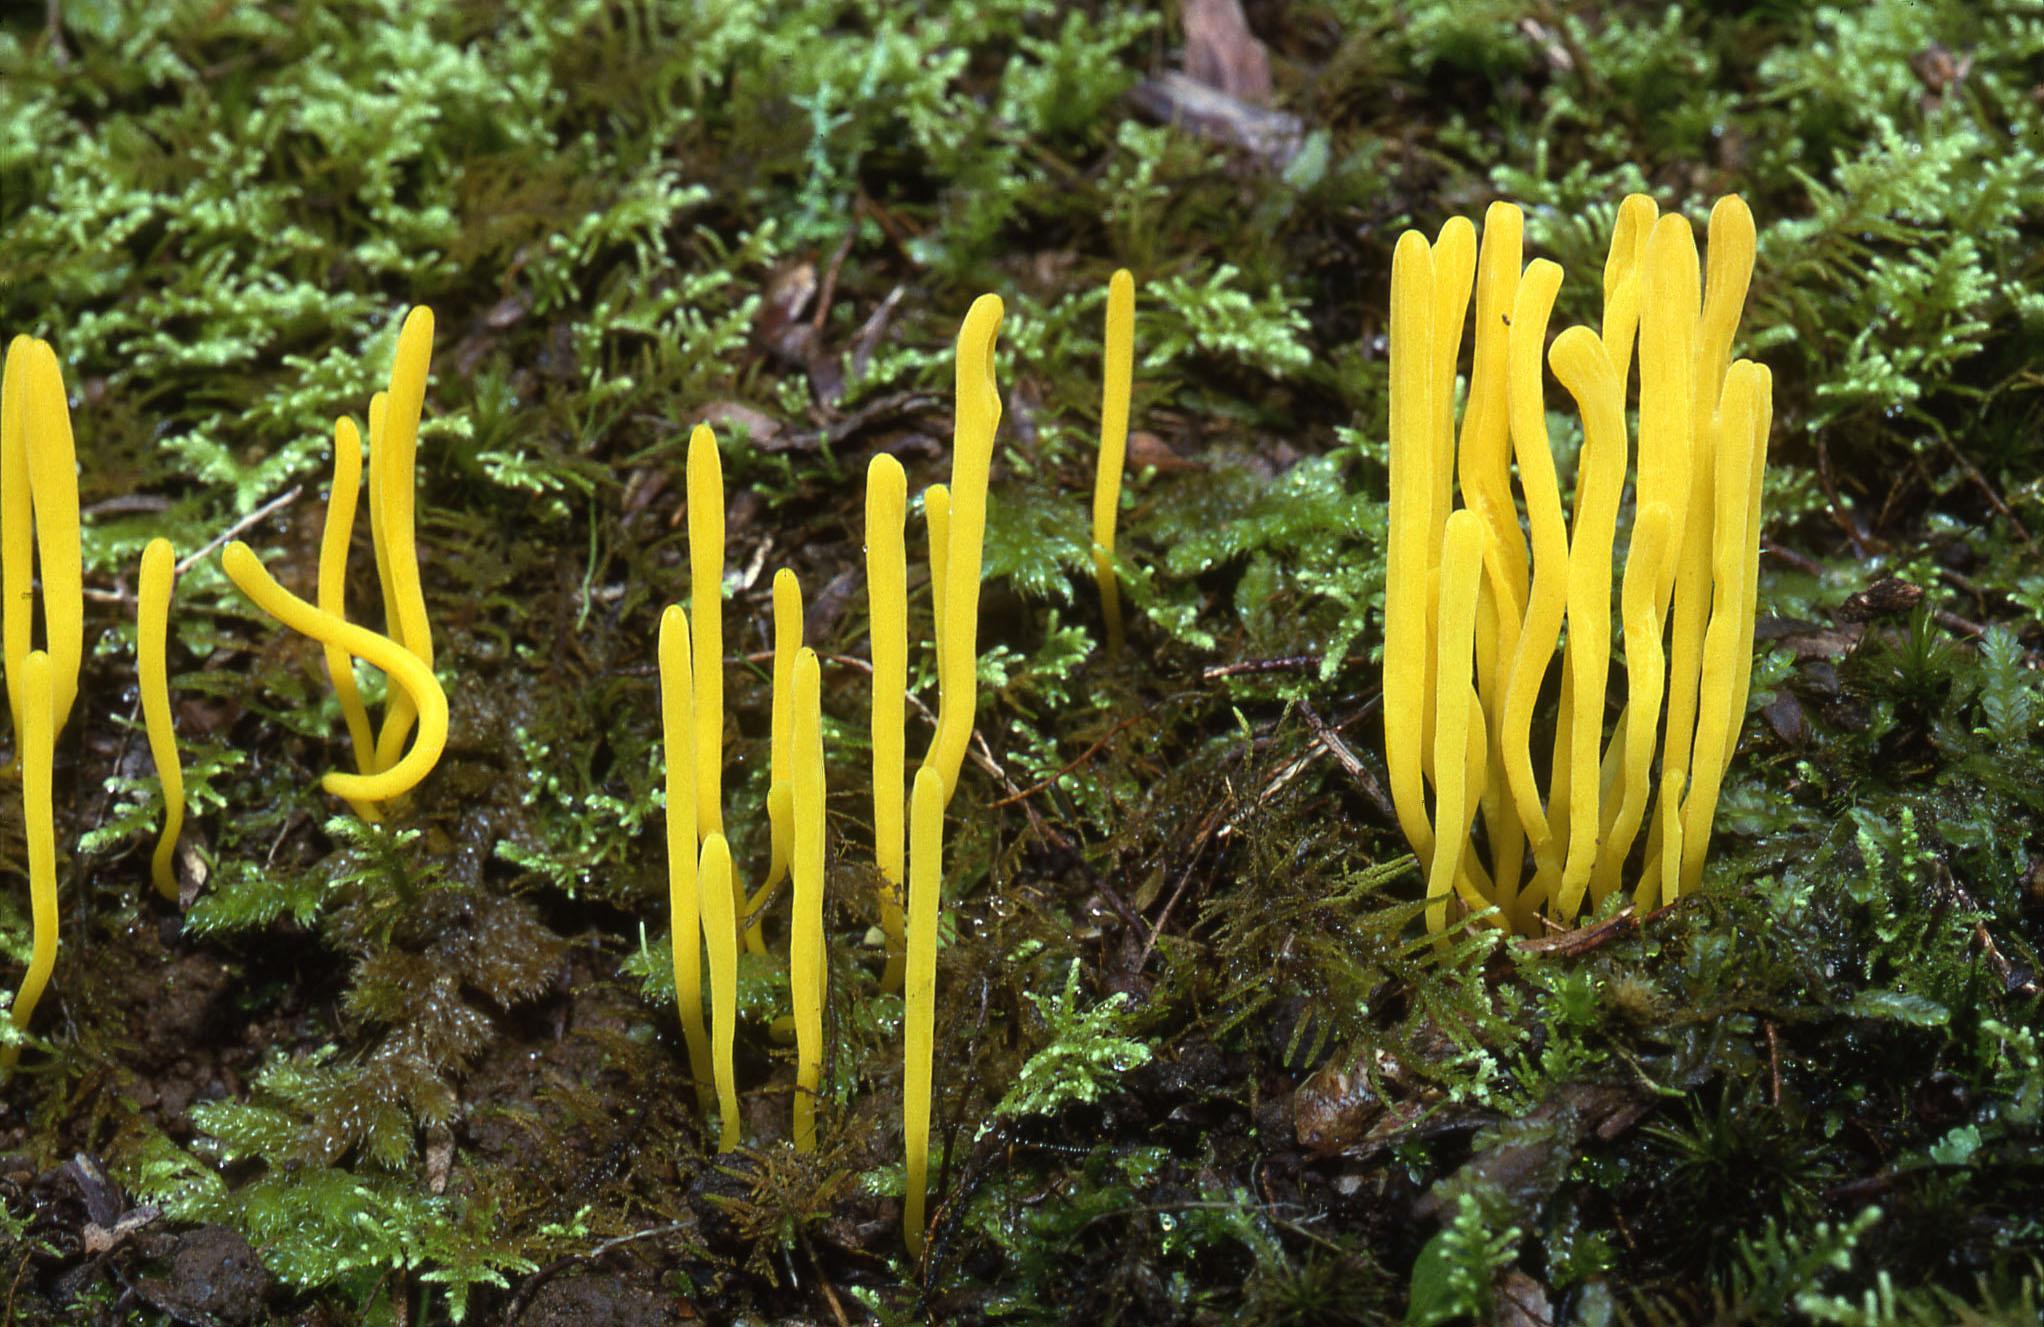 Coral fungi - Clavaria amoena